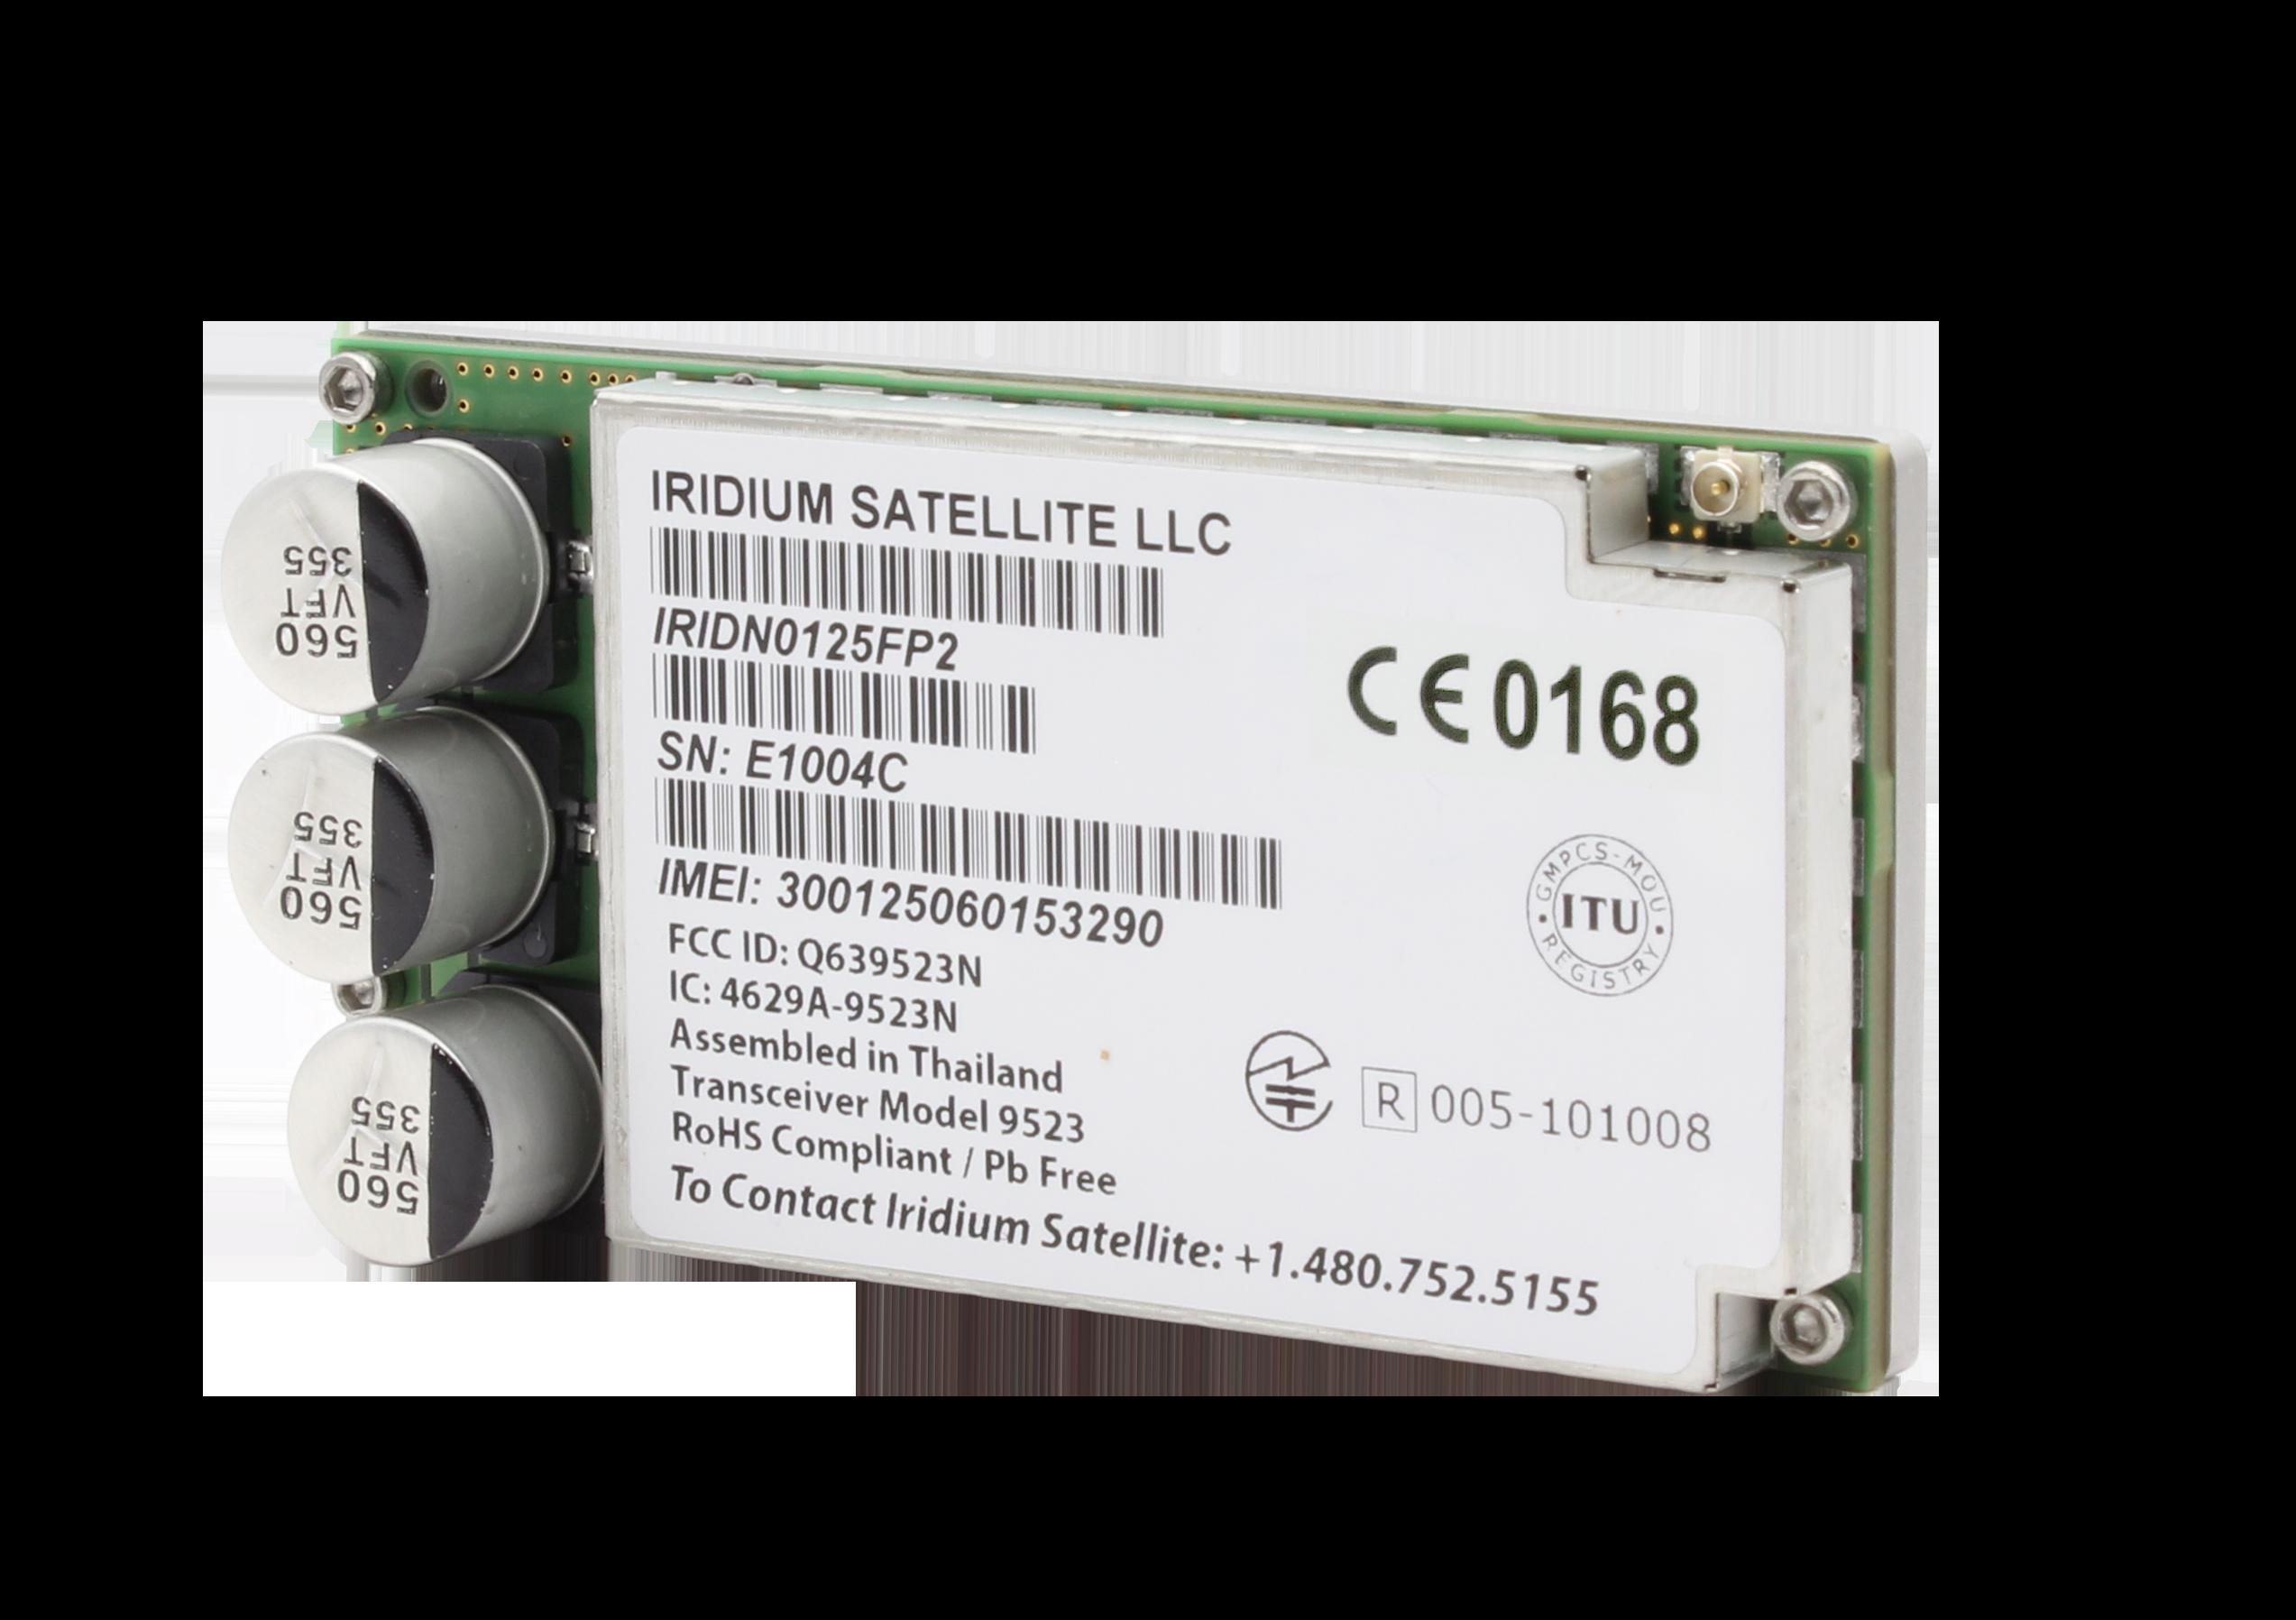 Iridium Core 9523N embedded transceiver.